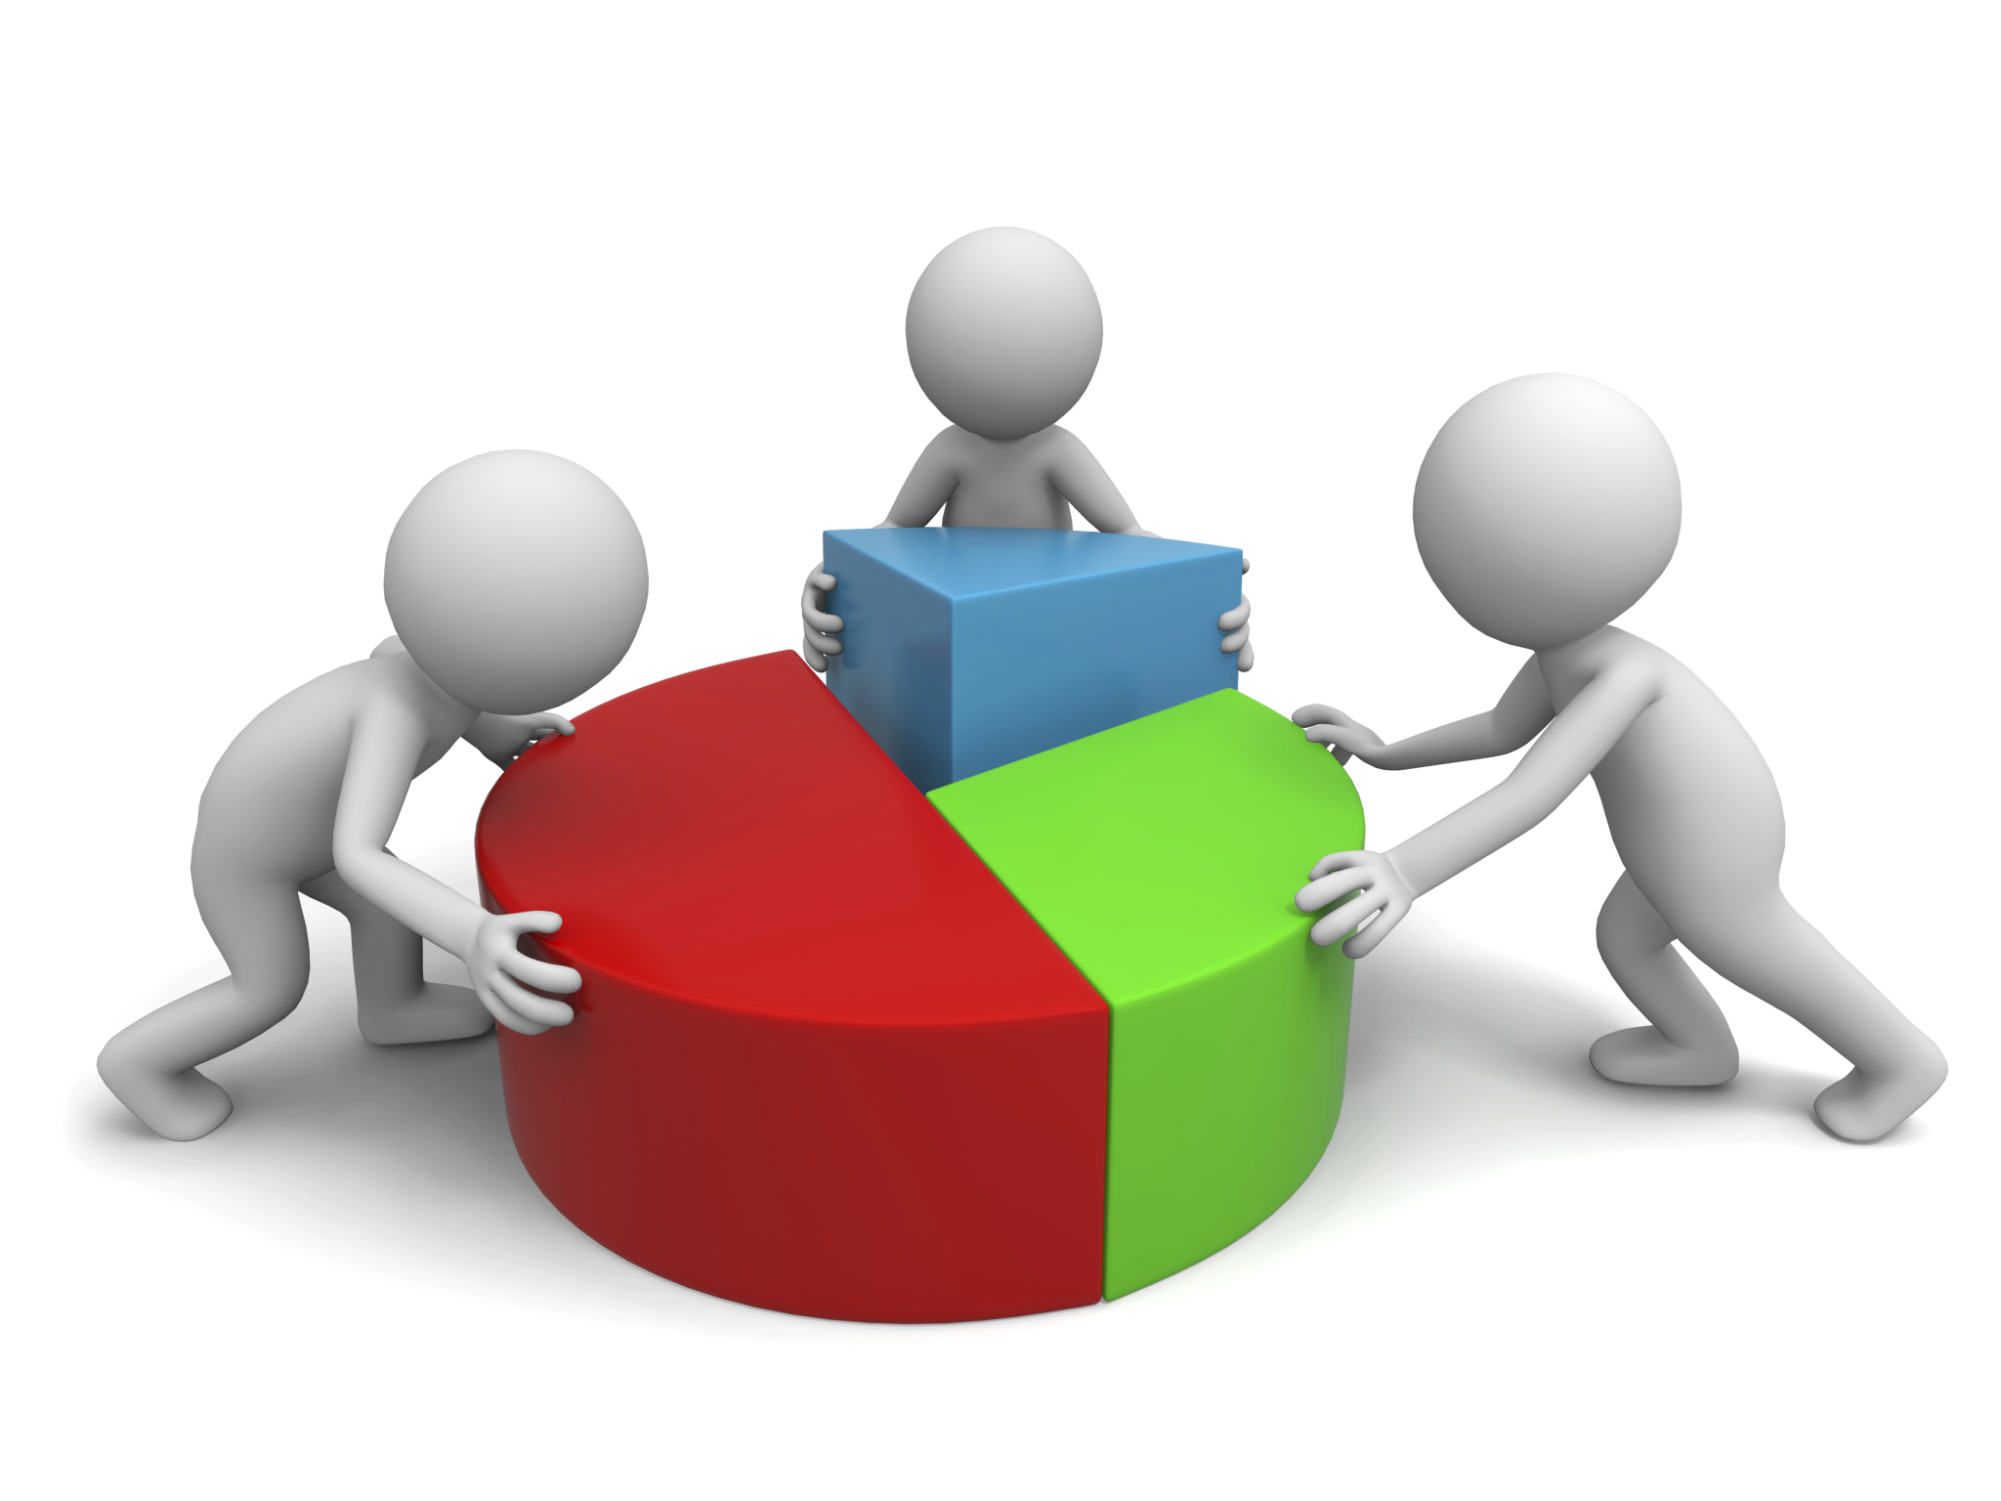 The Disadvantages of Balanced Scorecards   Bizfluent